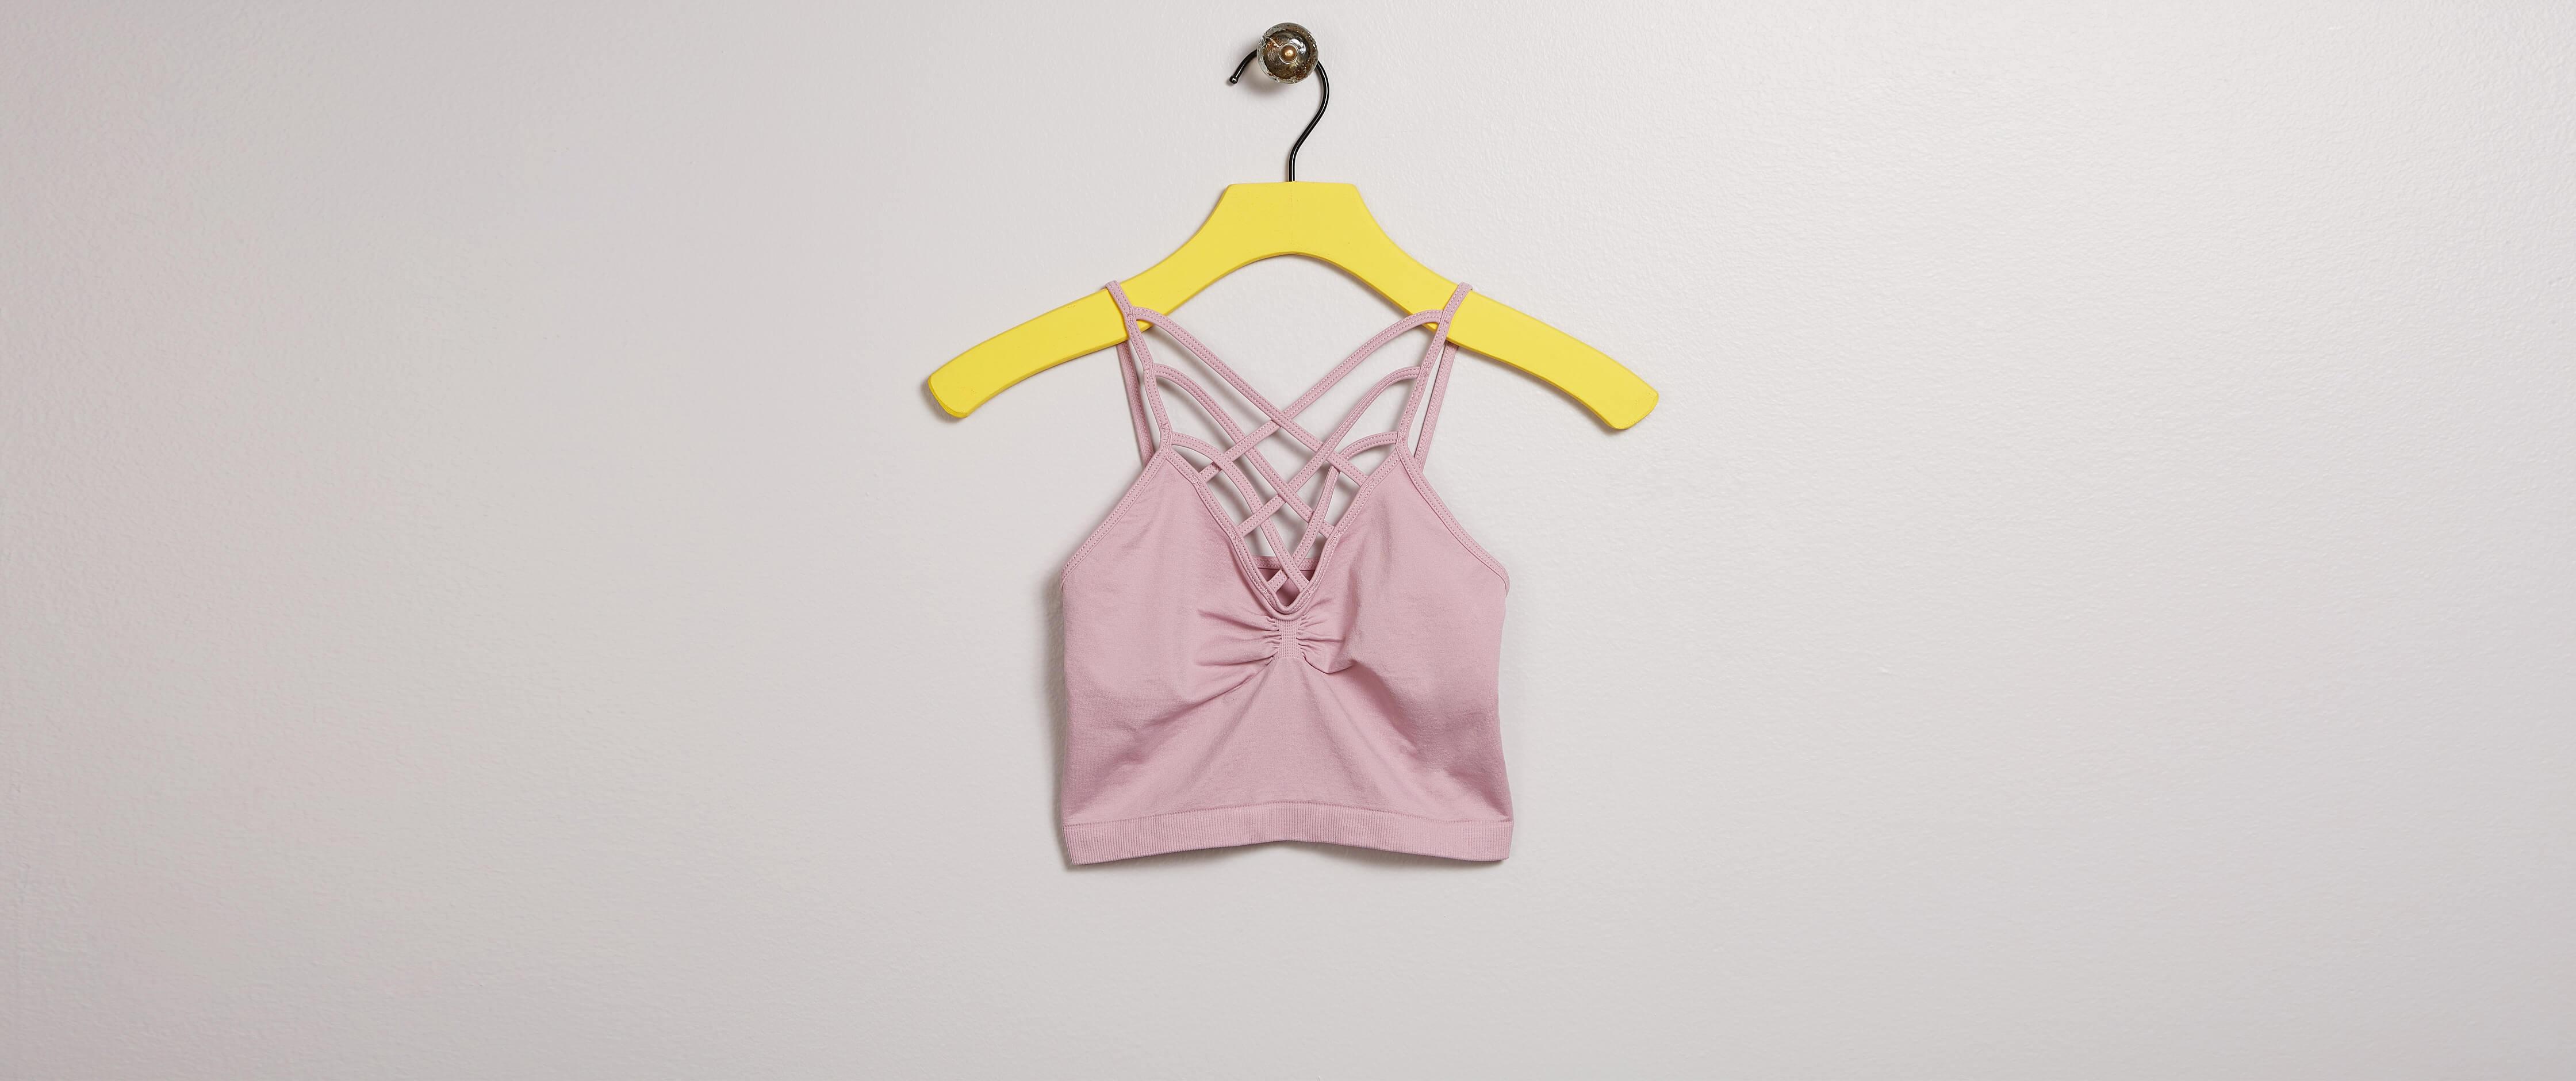 Top Girls - Suzette Strappy Bralette for sale